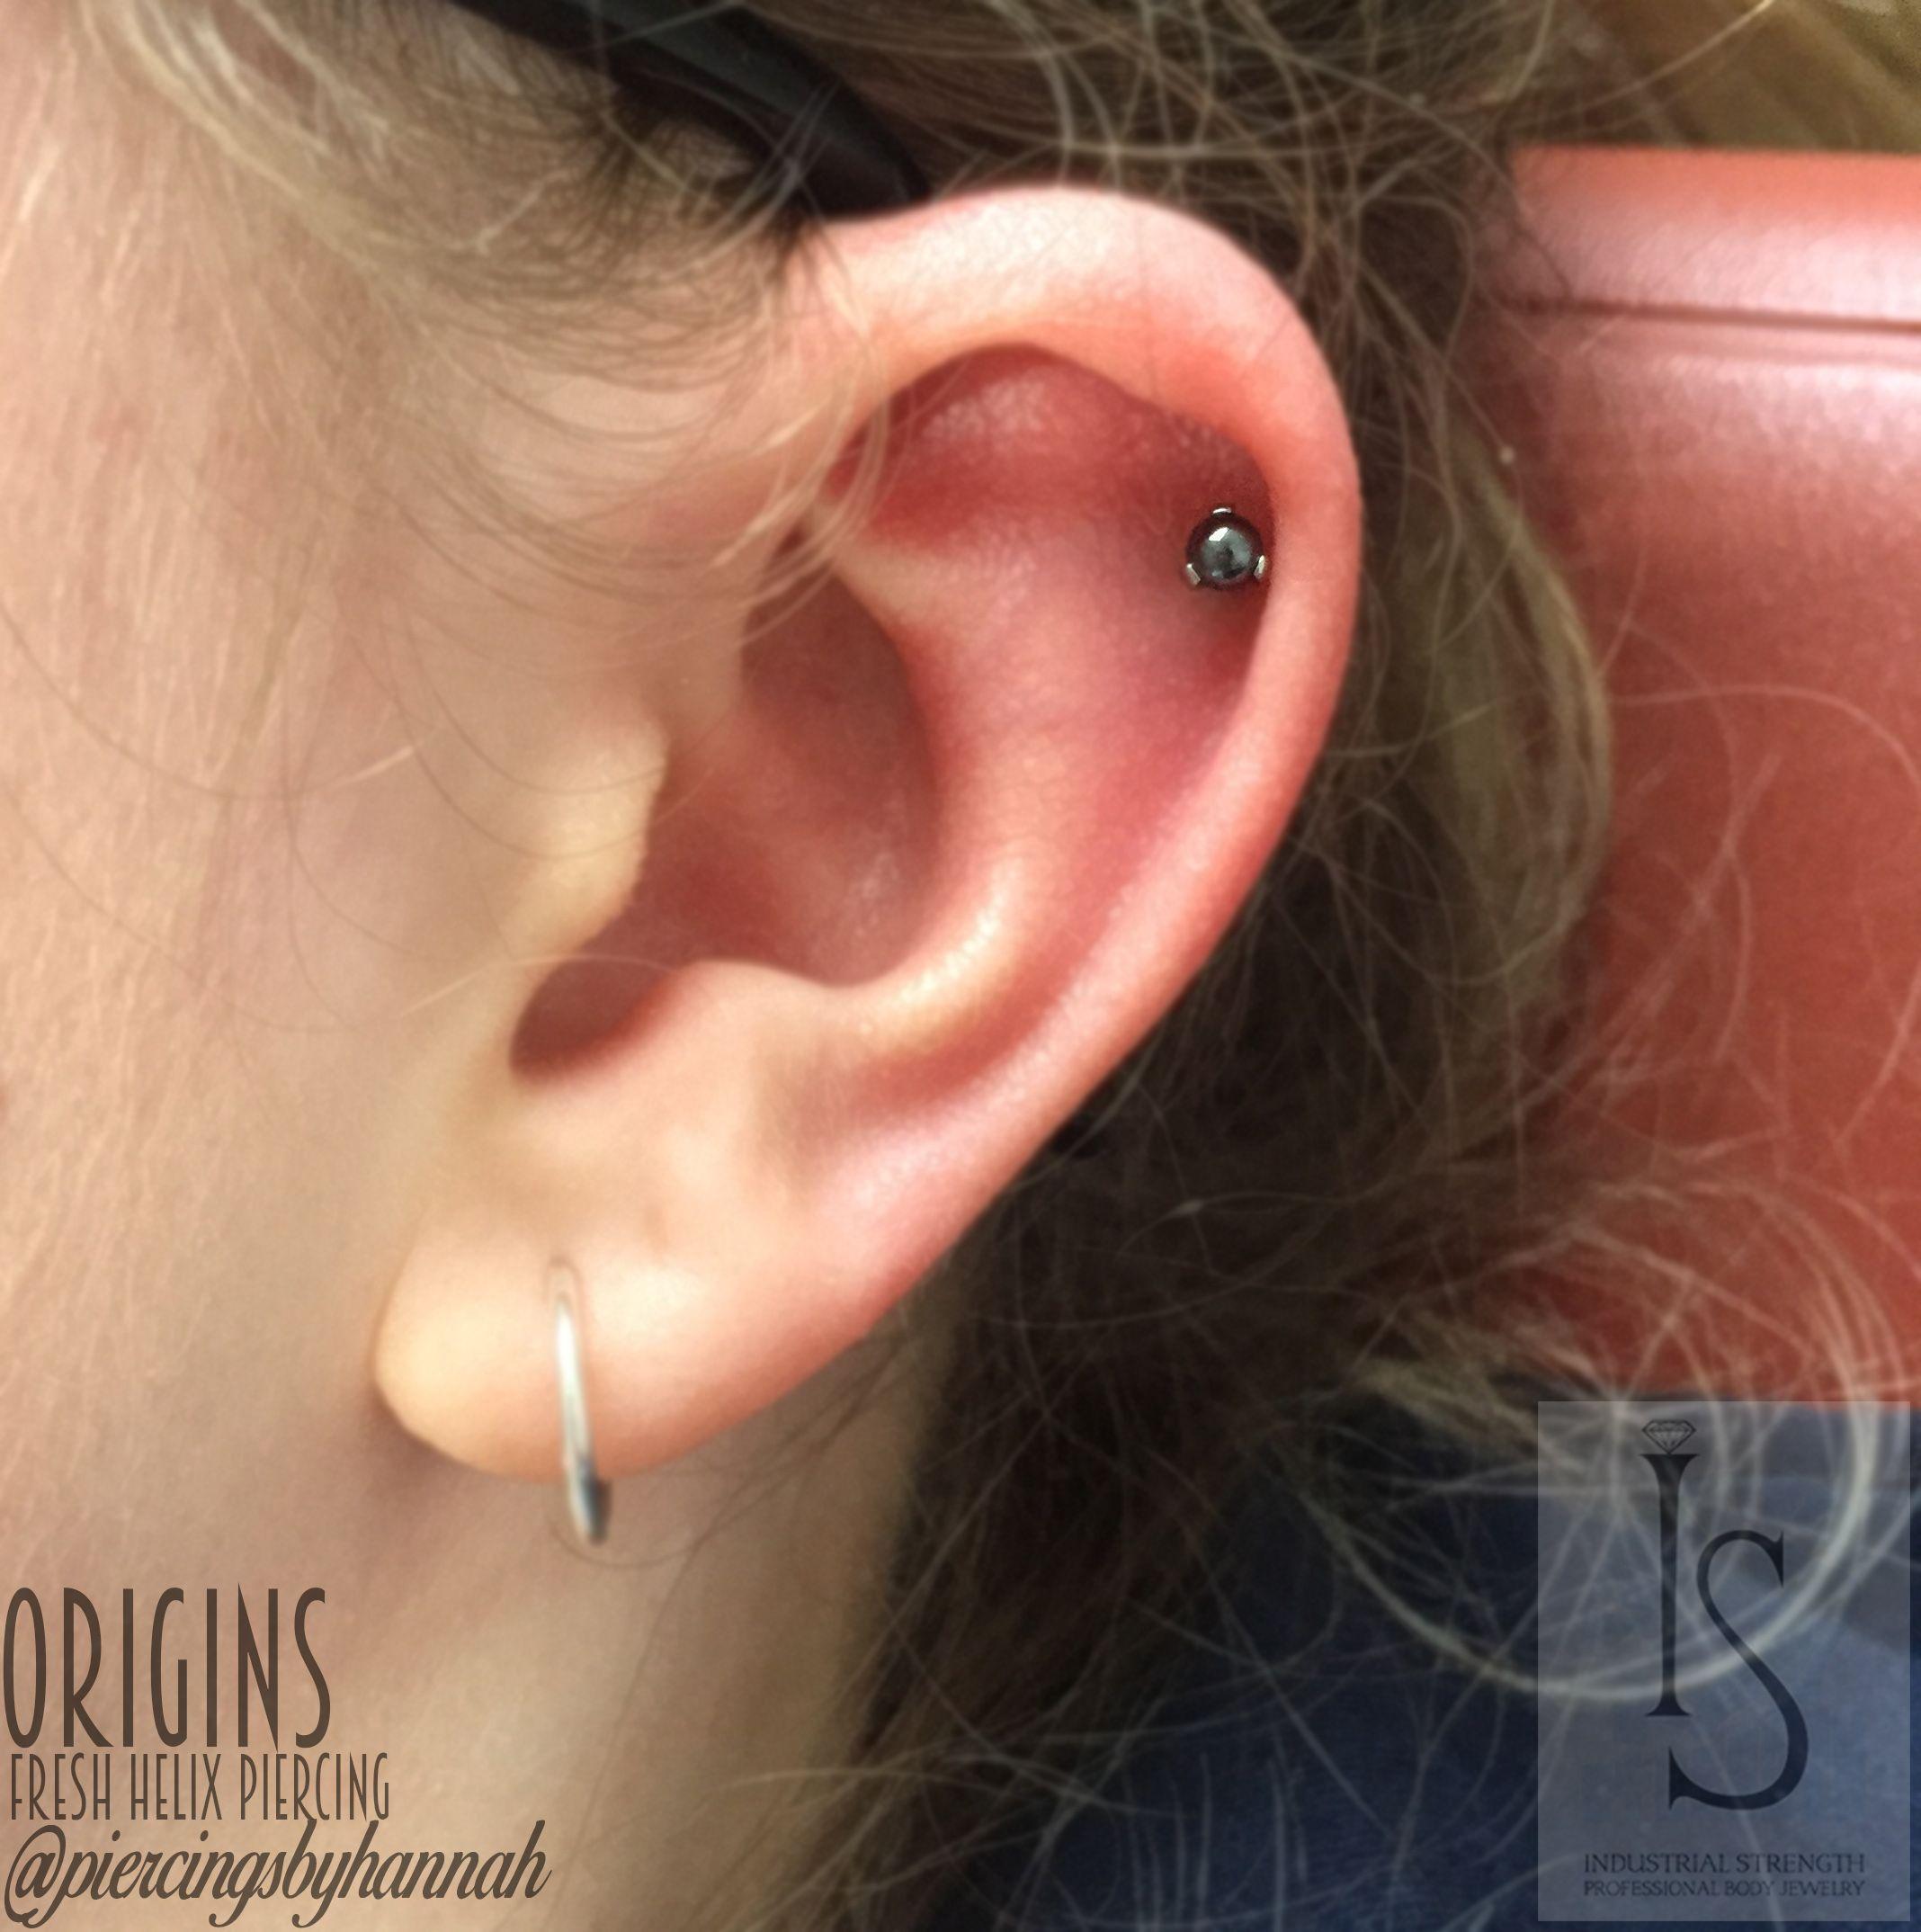 Fresh Helix Piercing Pierced By Piercingsbyhannah Studio Origin